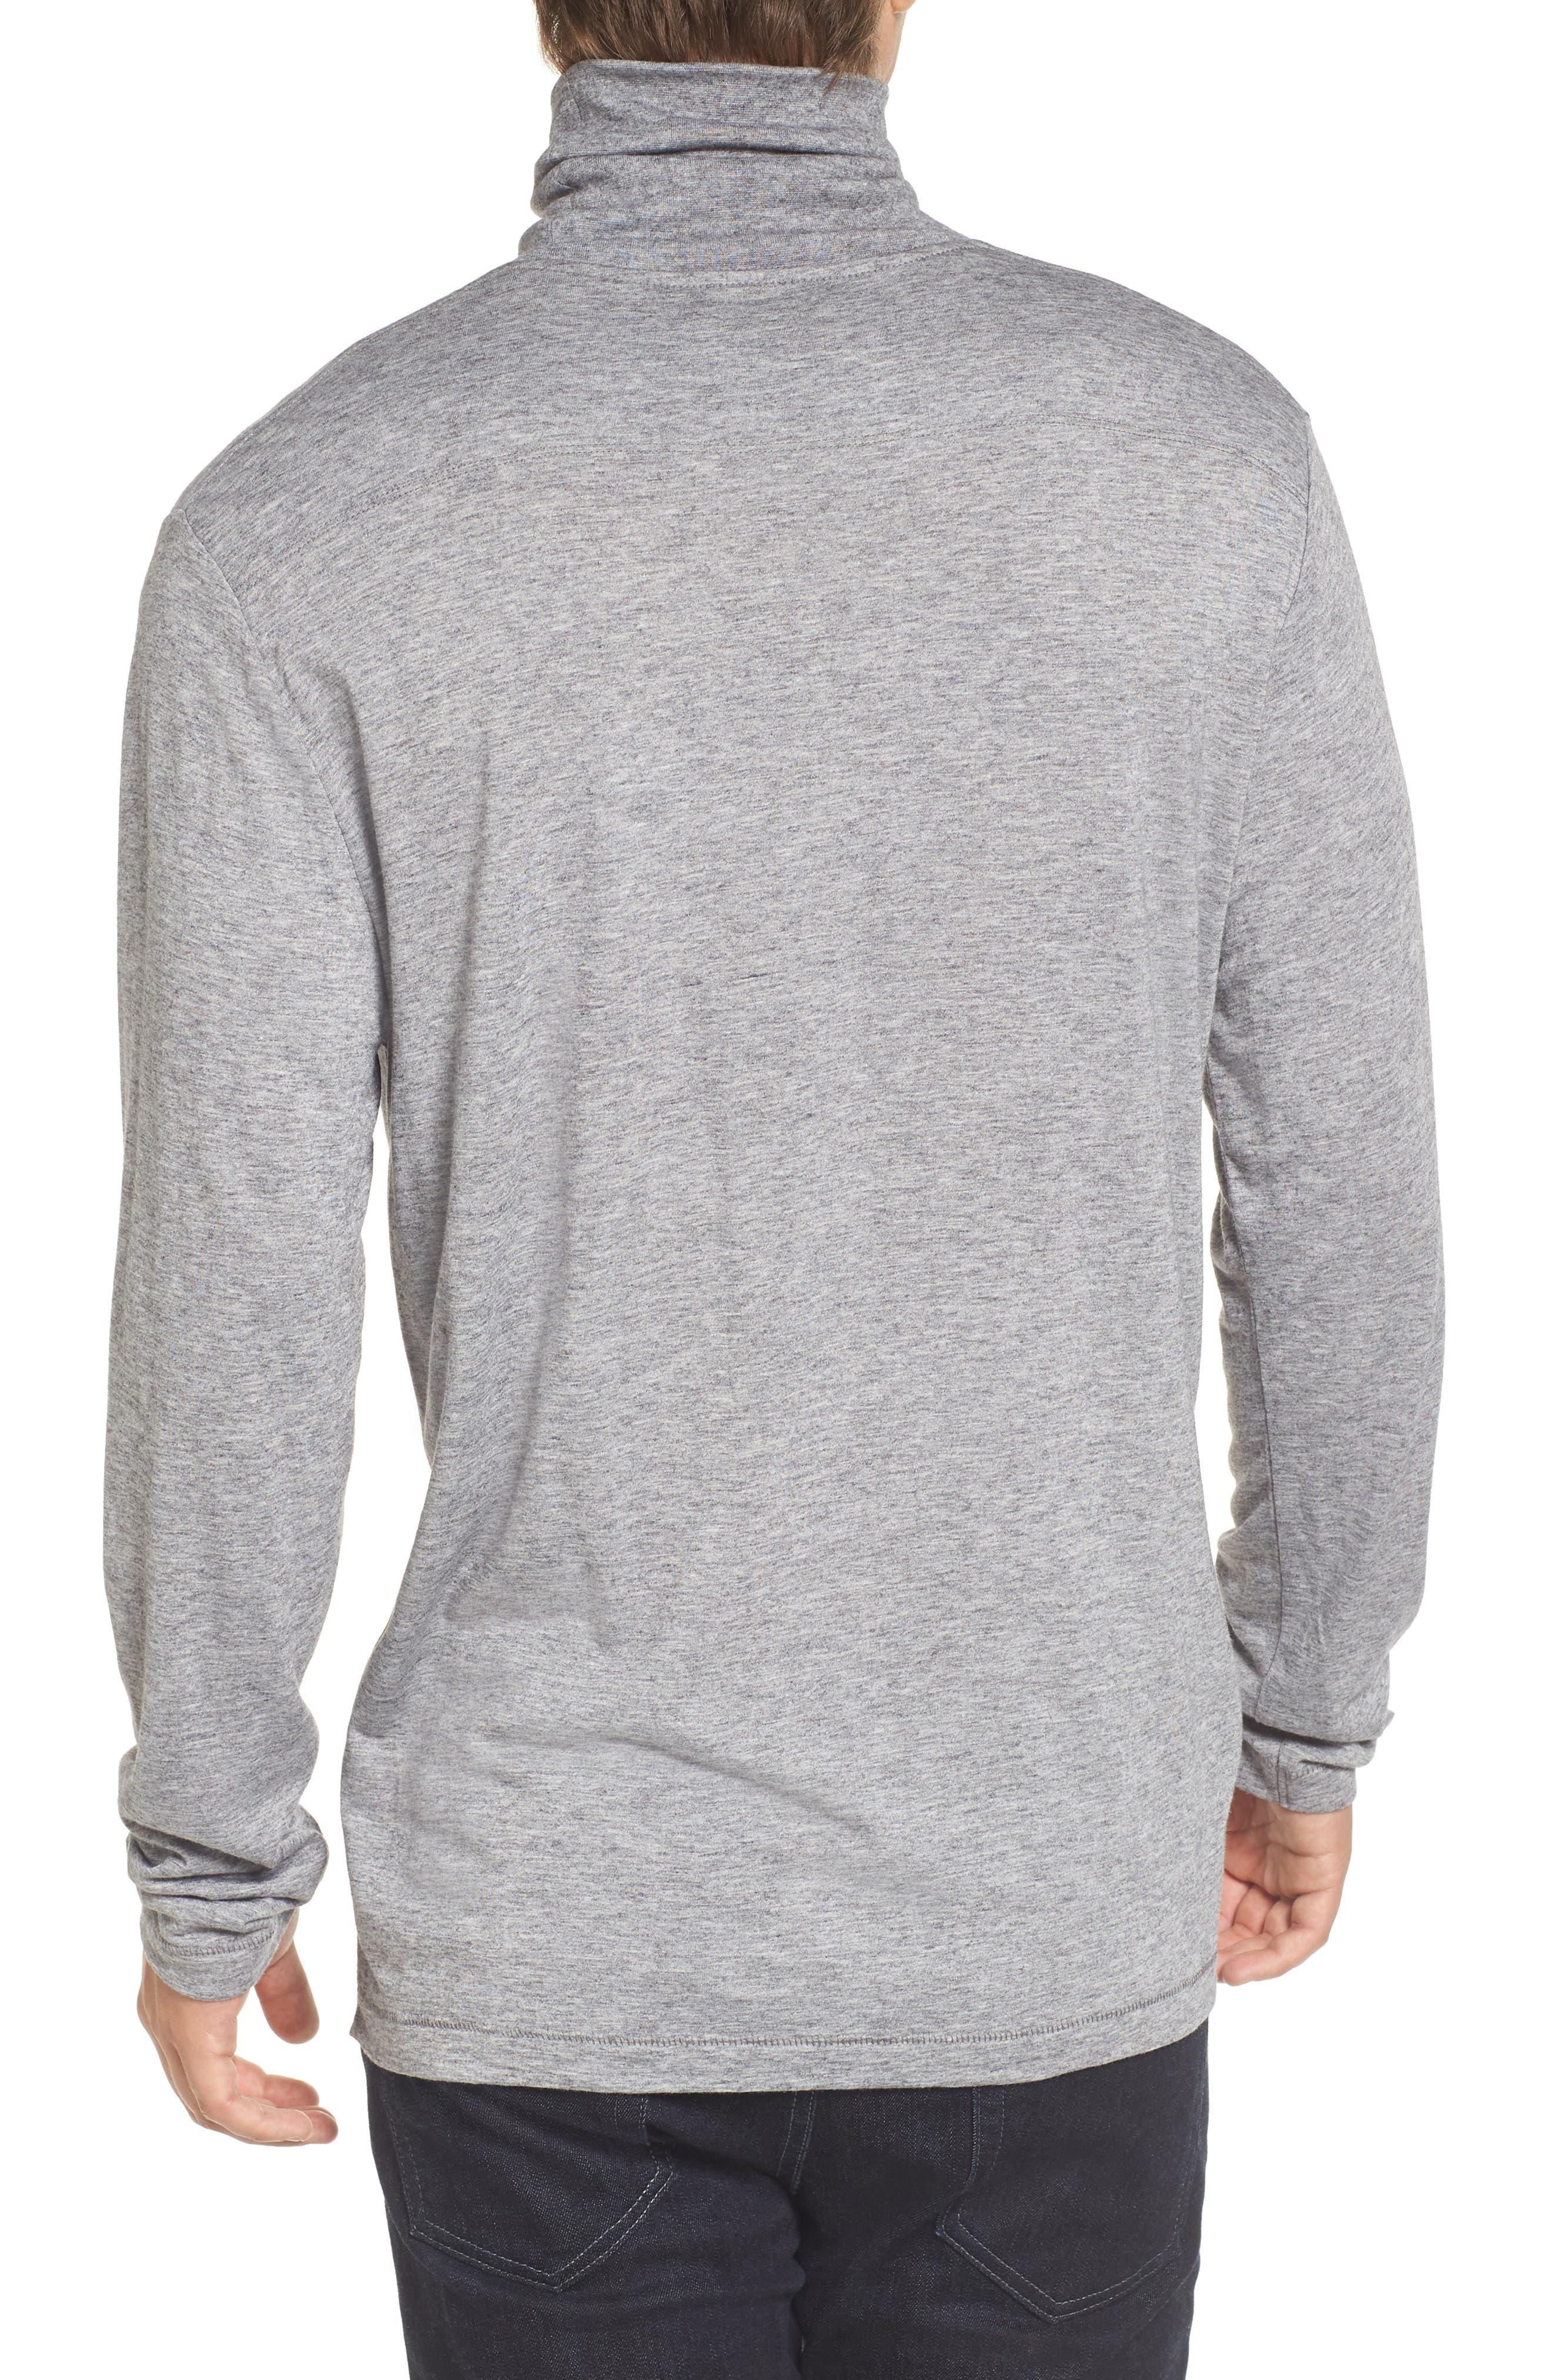 Lightweight Turtleneck Sweater,                             Alternate thumbnail 2, color,                             030